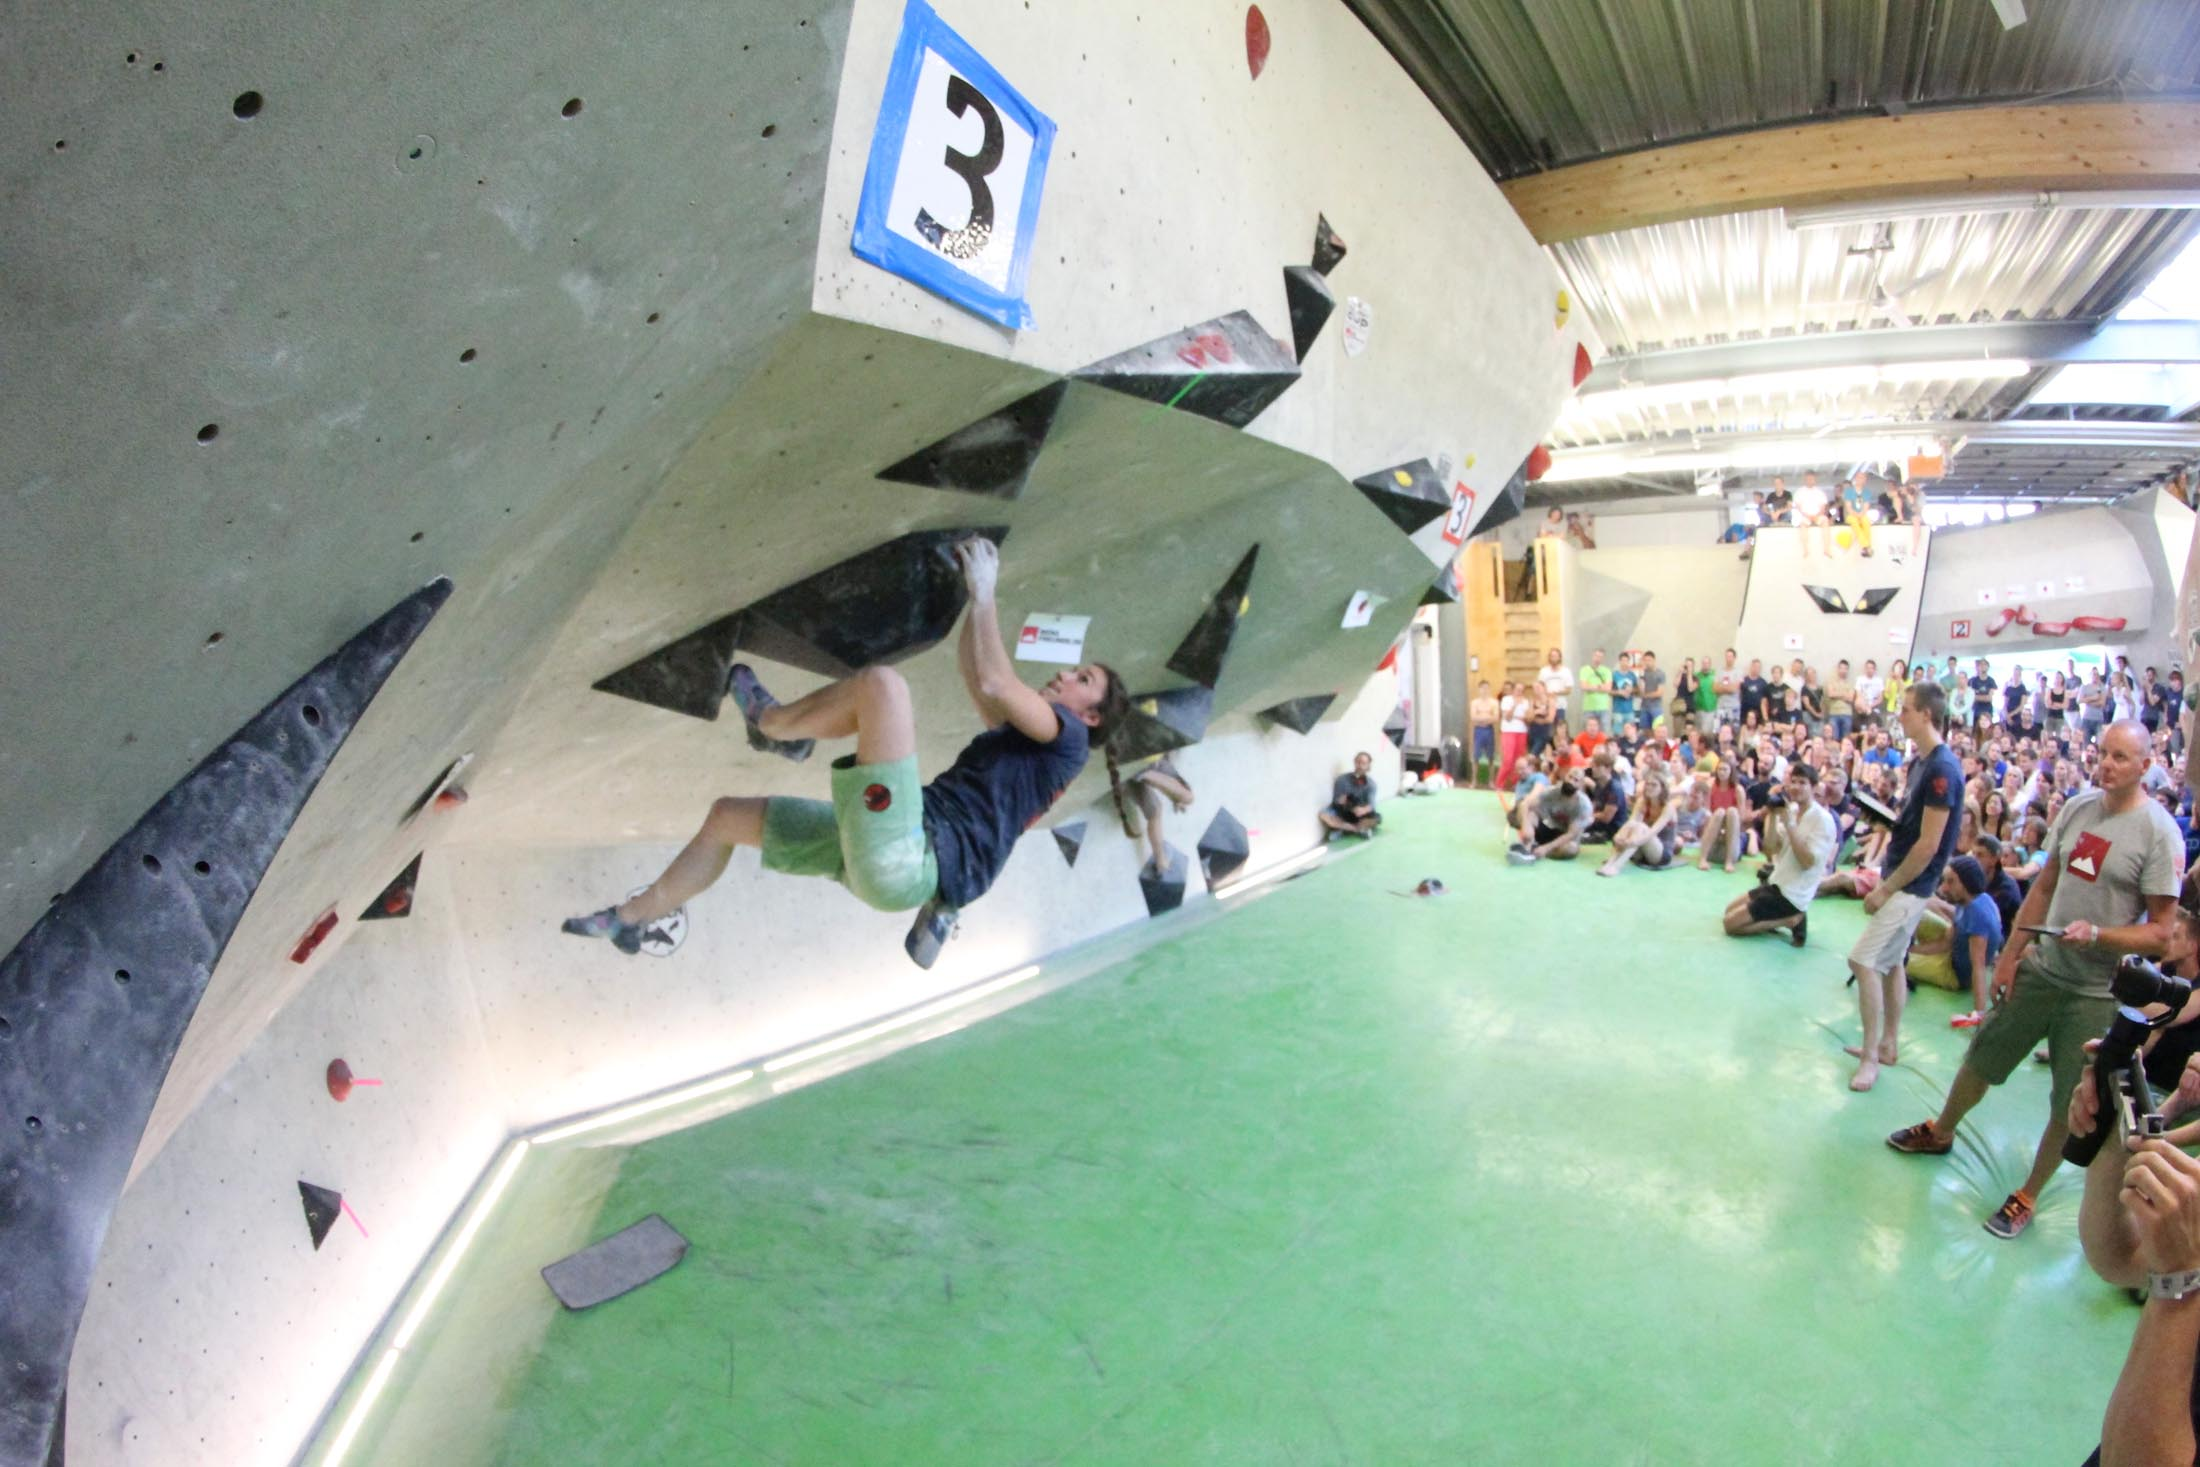 Juliane Wurm, internationaler bouldercup Frankenjura, BLOCKHELDEN Erlangen, Bergfreunde.de, Mammut07092016045